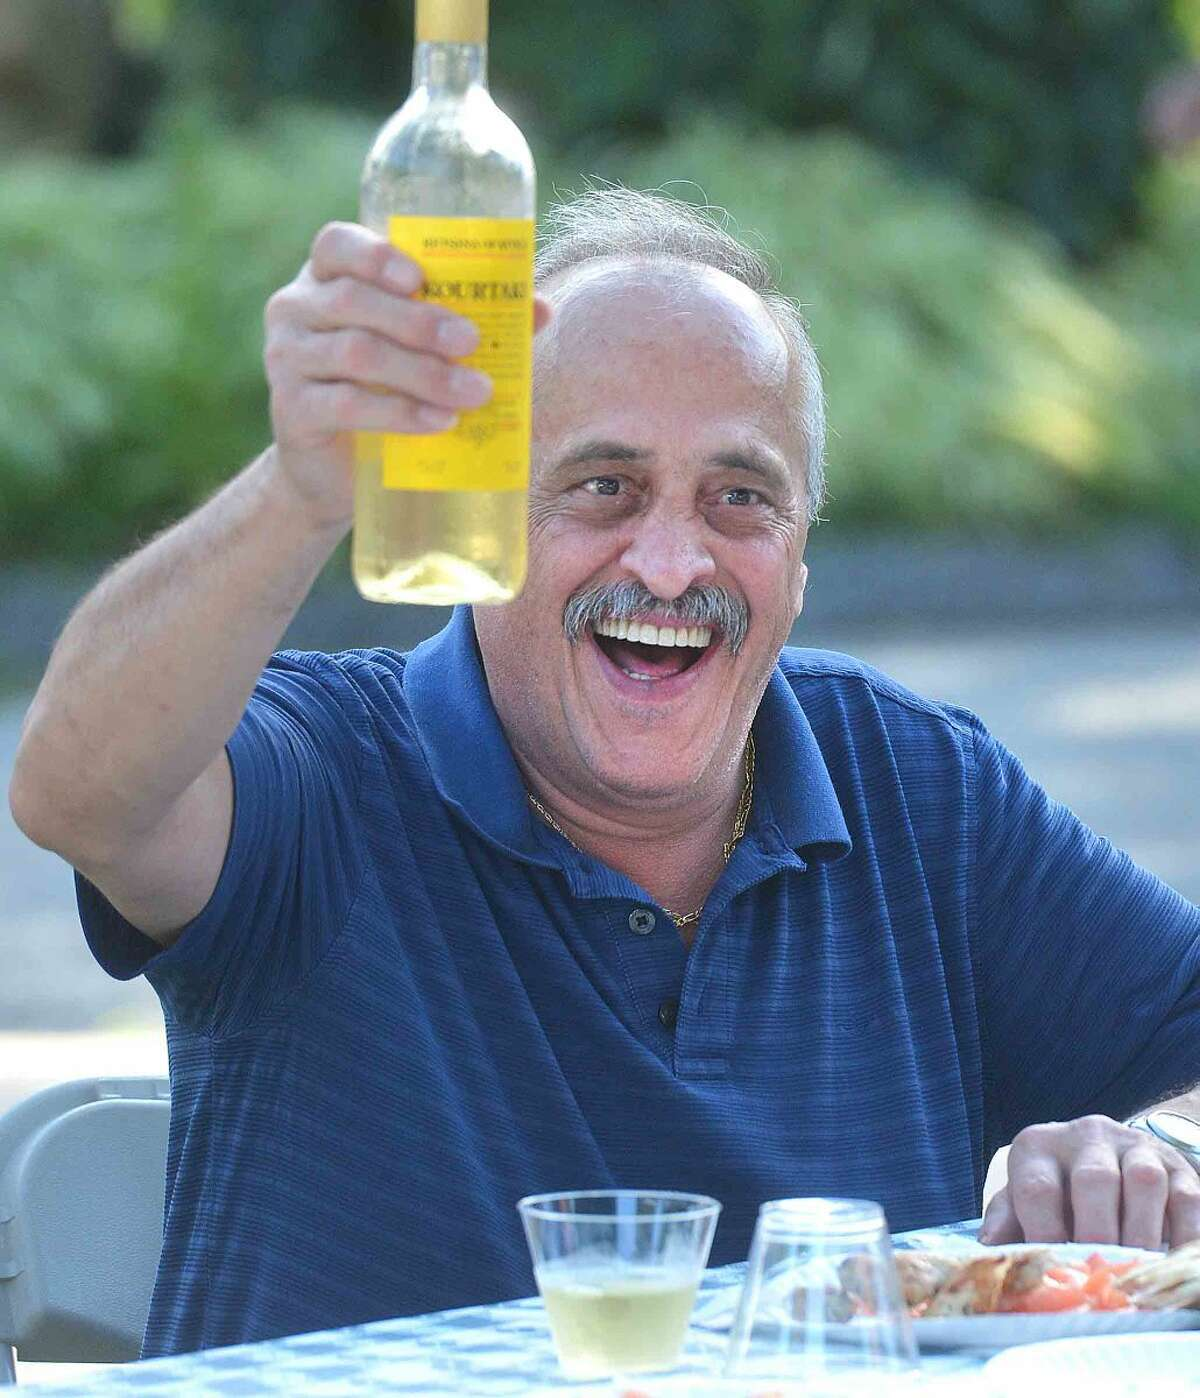 Hour Photo/Alex von Kleydorff Jimmy Iosisides enjoys some greek Retsina with freinds and family at the 2015 Norwalk Greek Festival at St George Greek Orthodox Church